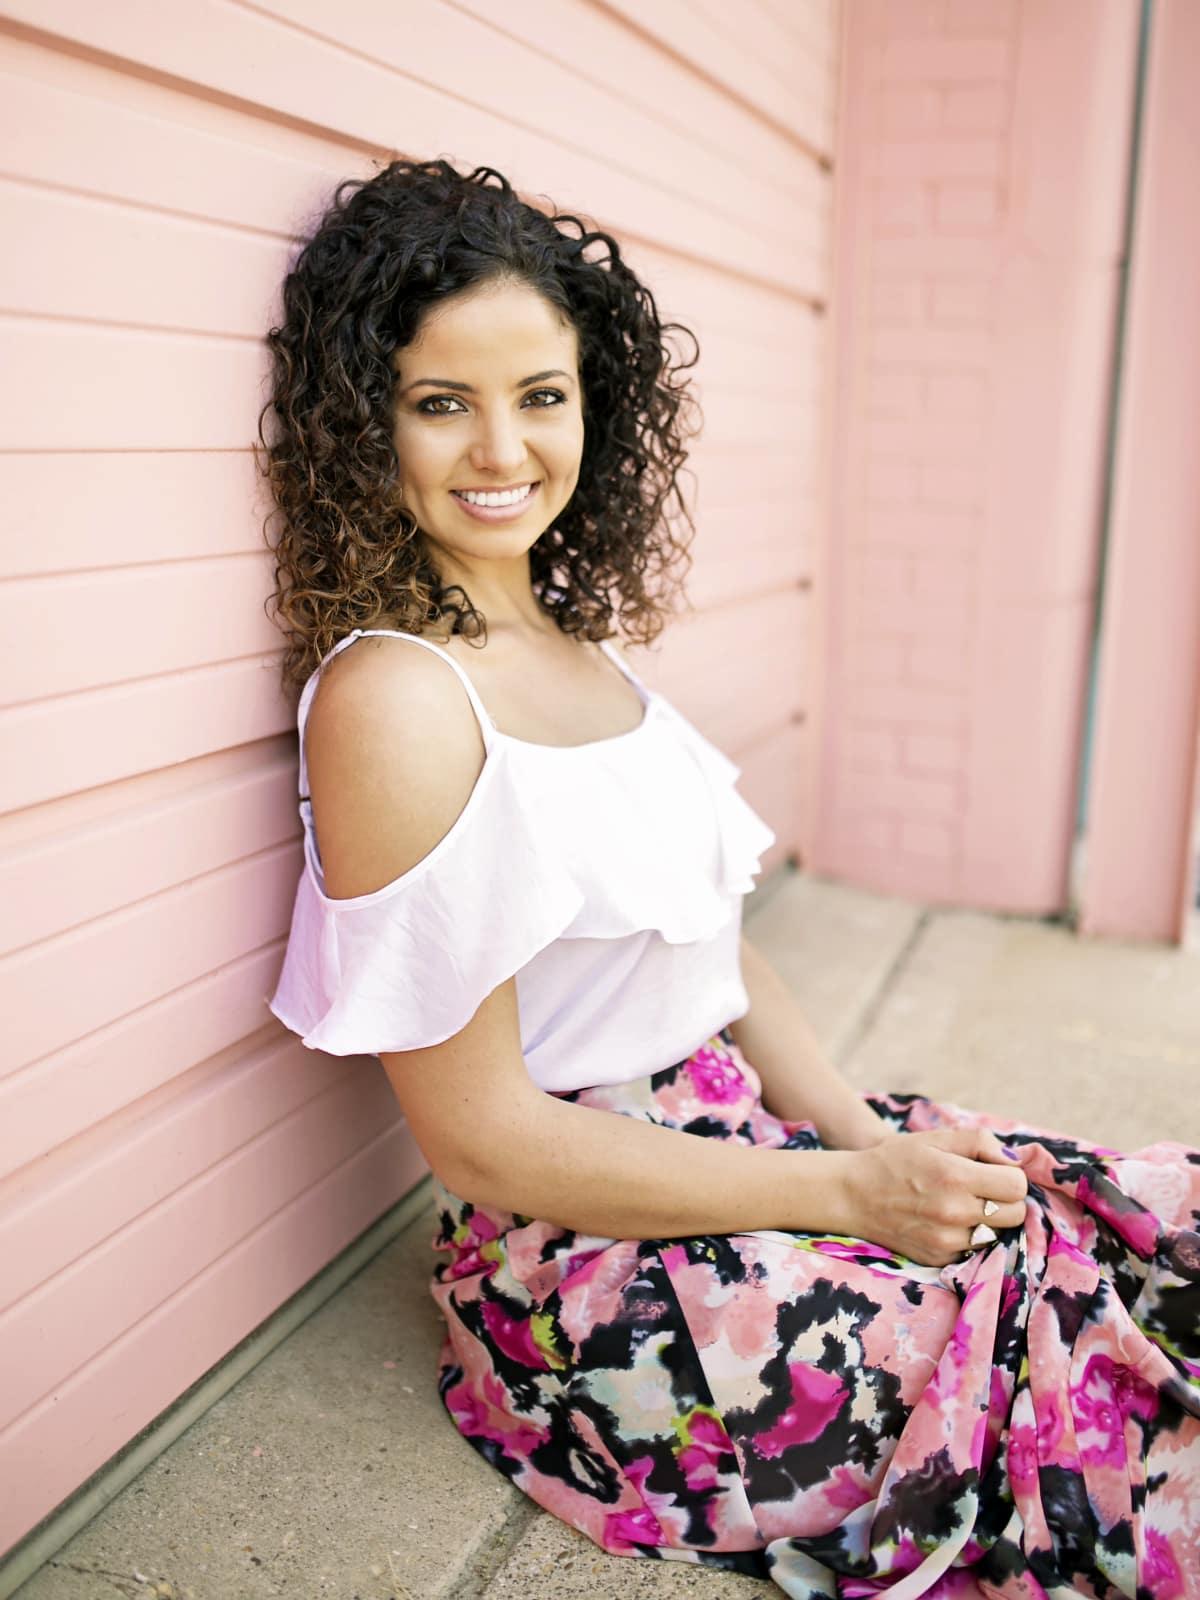 Stylemaker nominee Nicole Bulcher